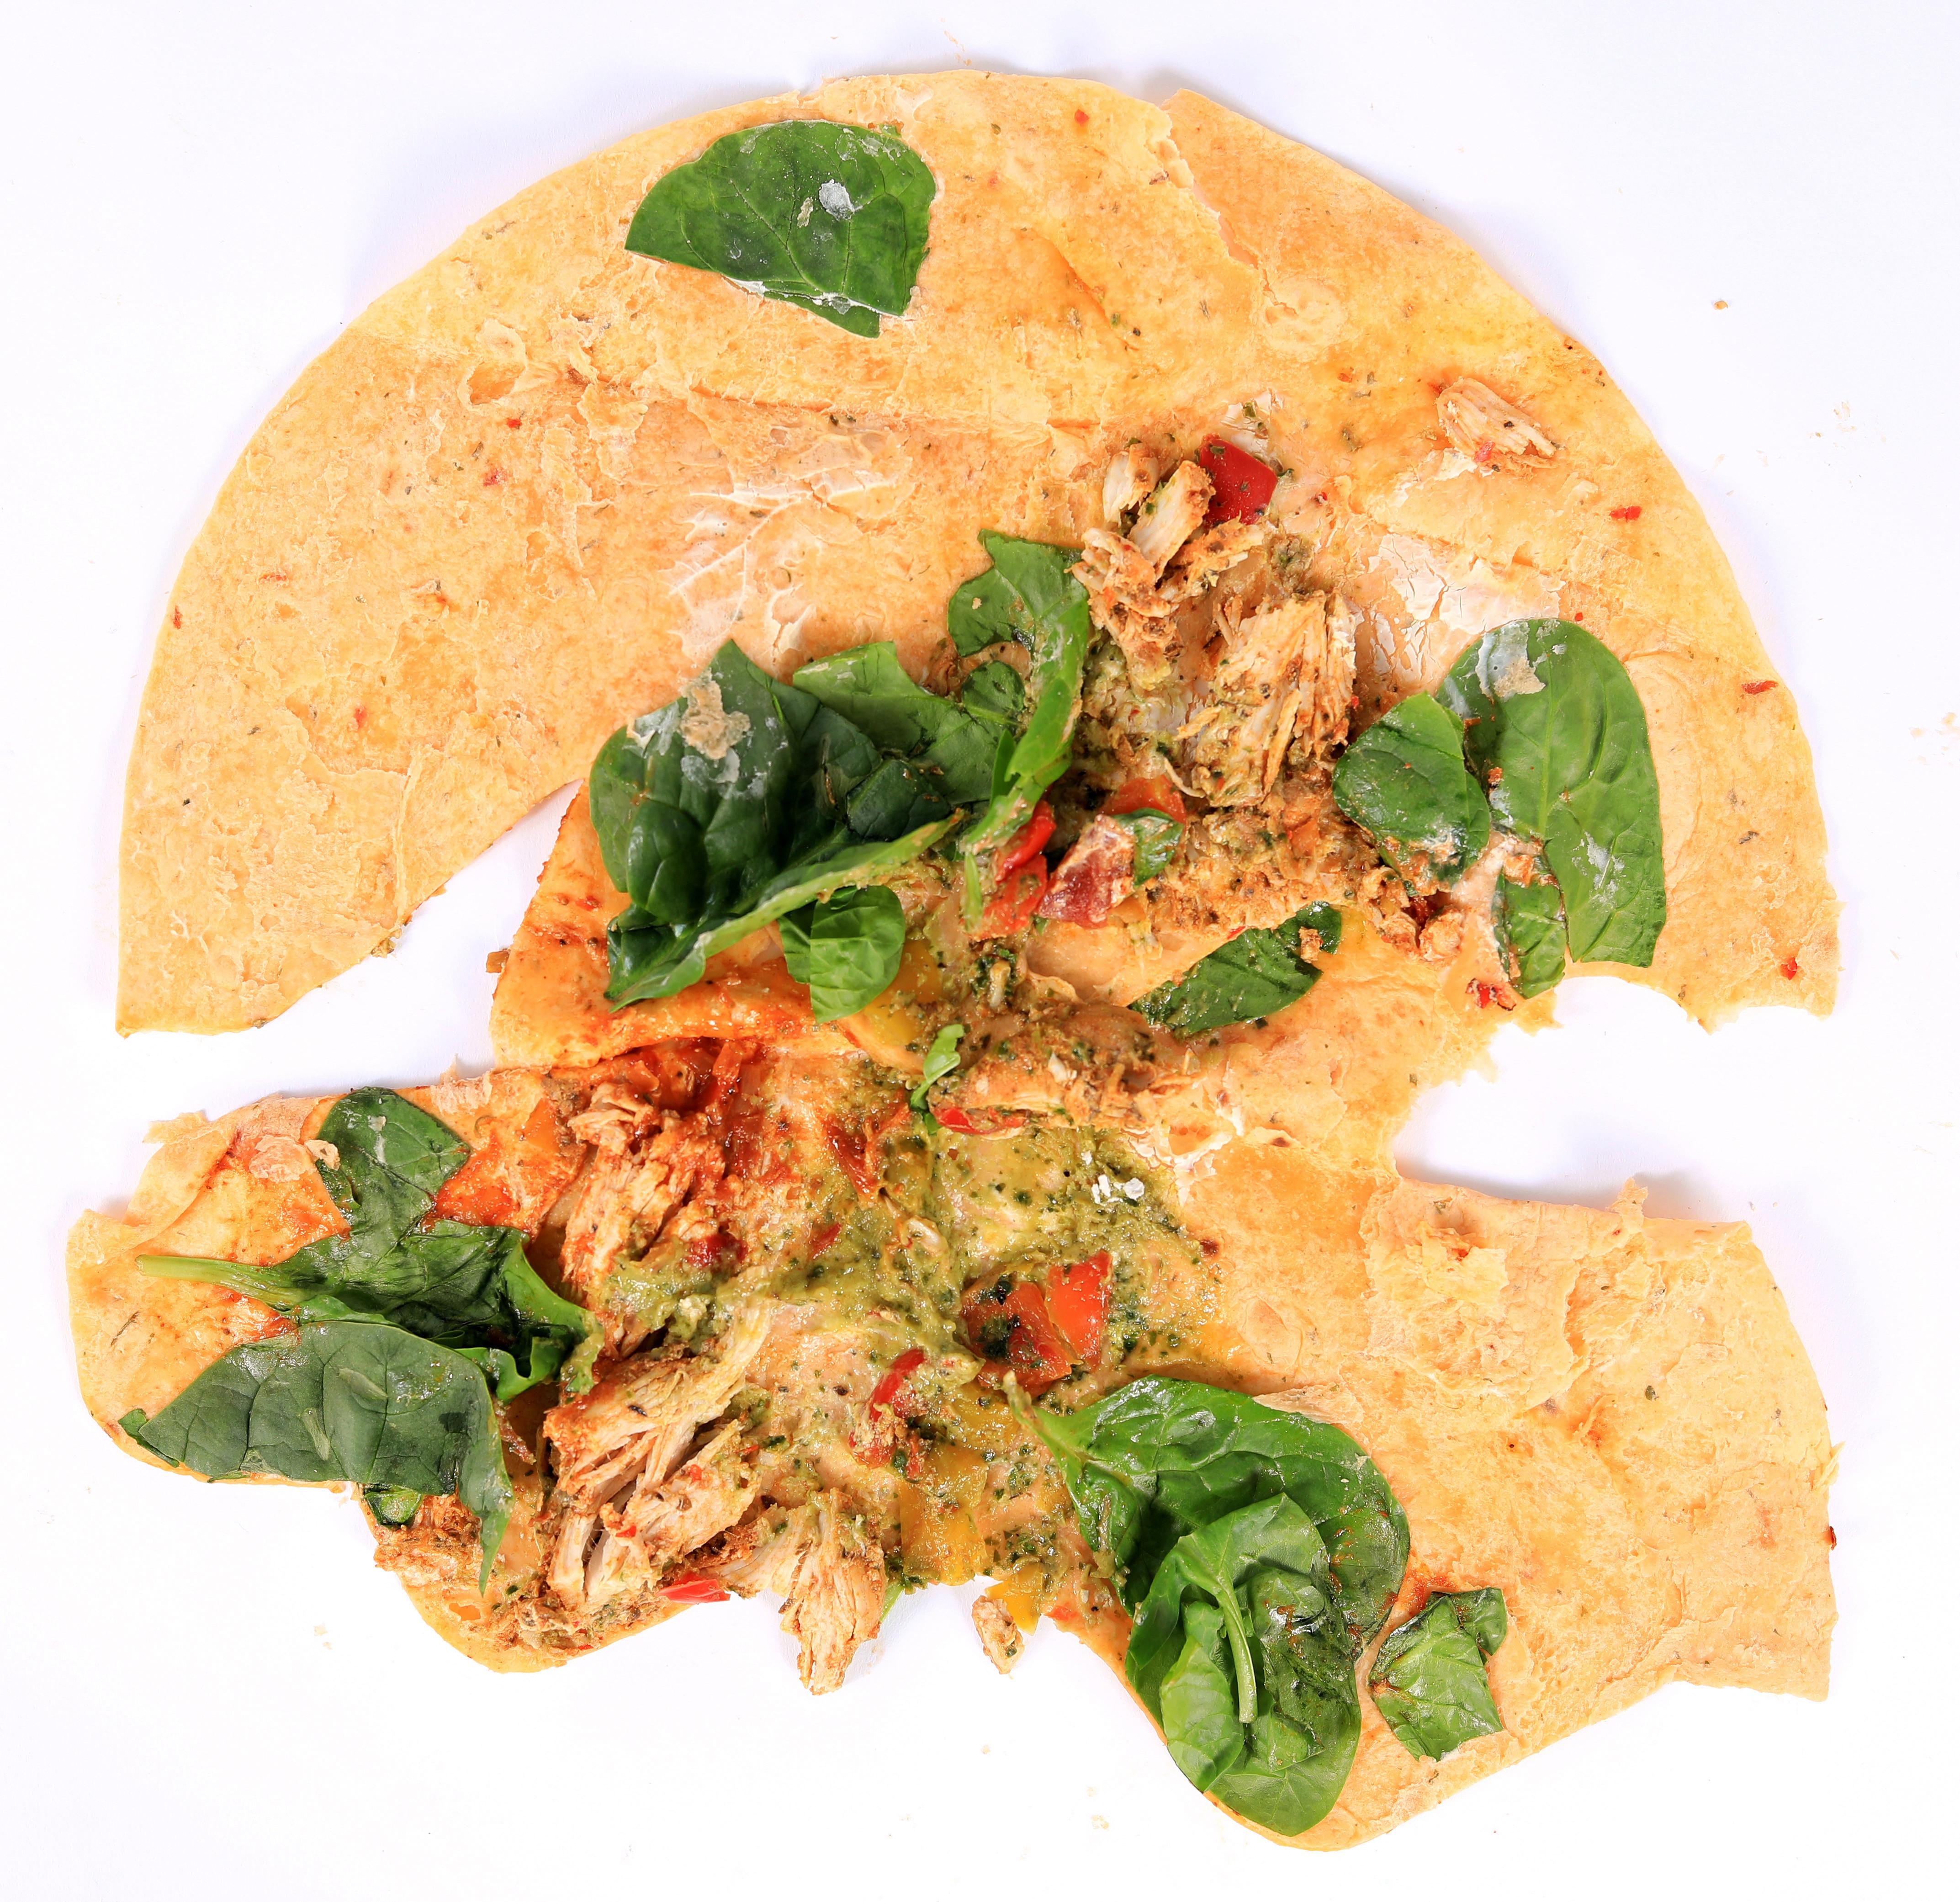 M&S: Chicken Fajita